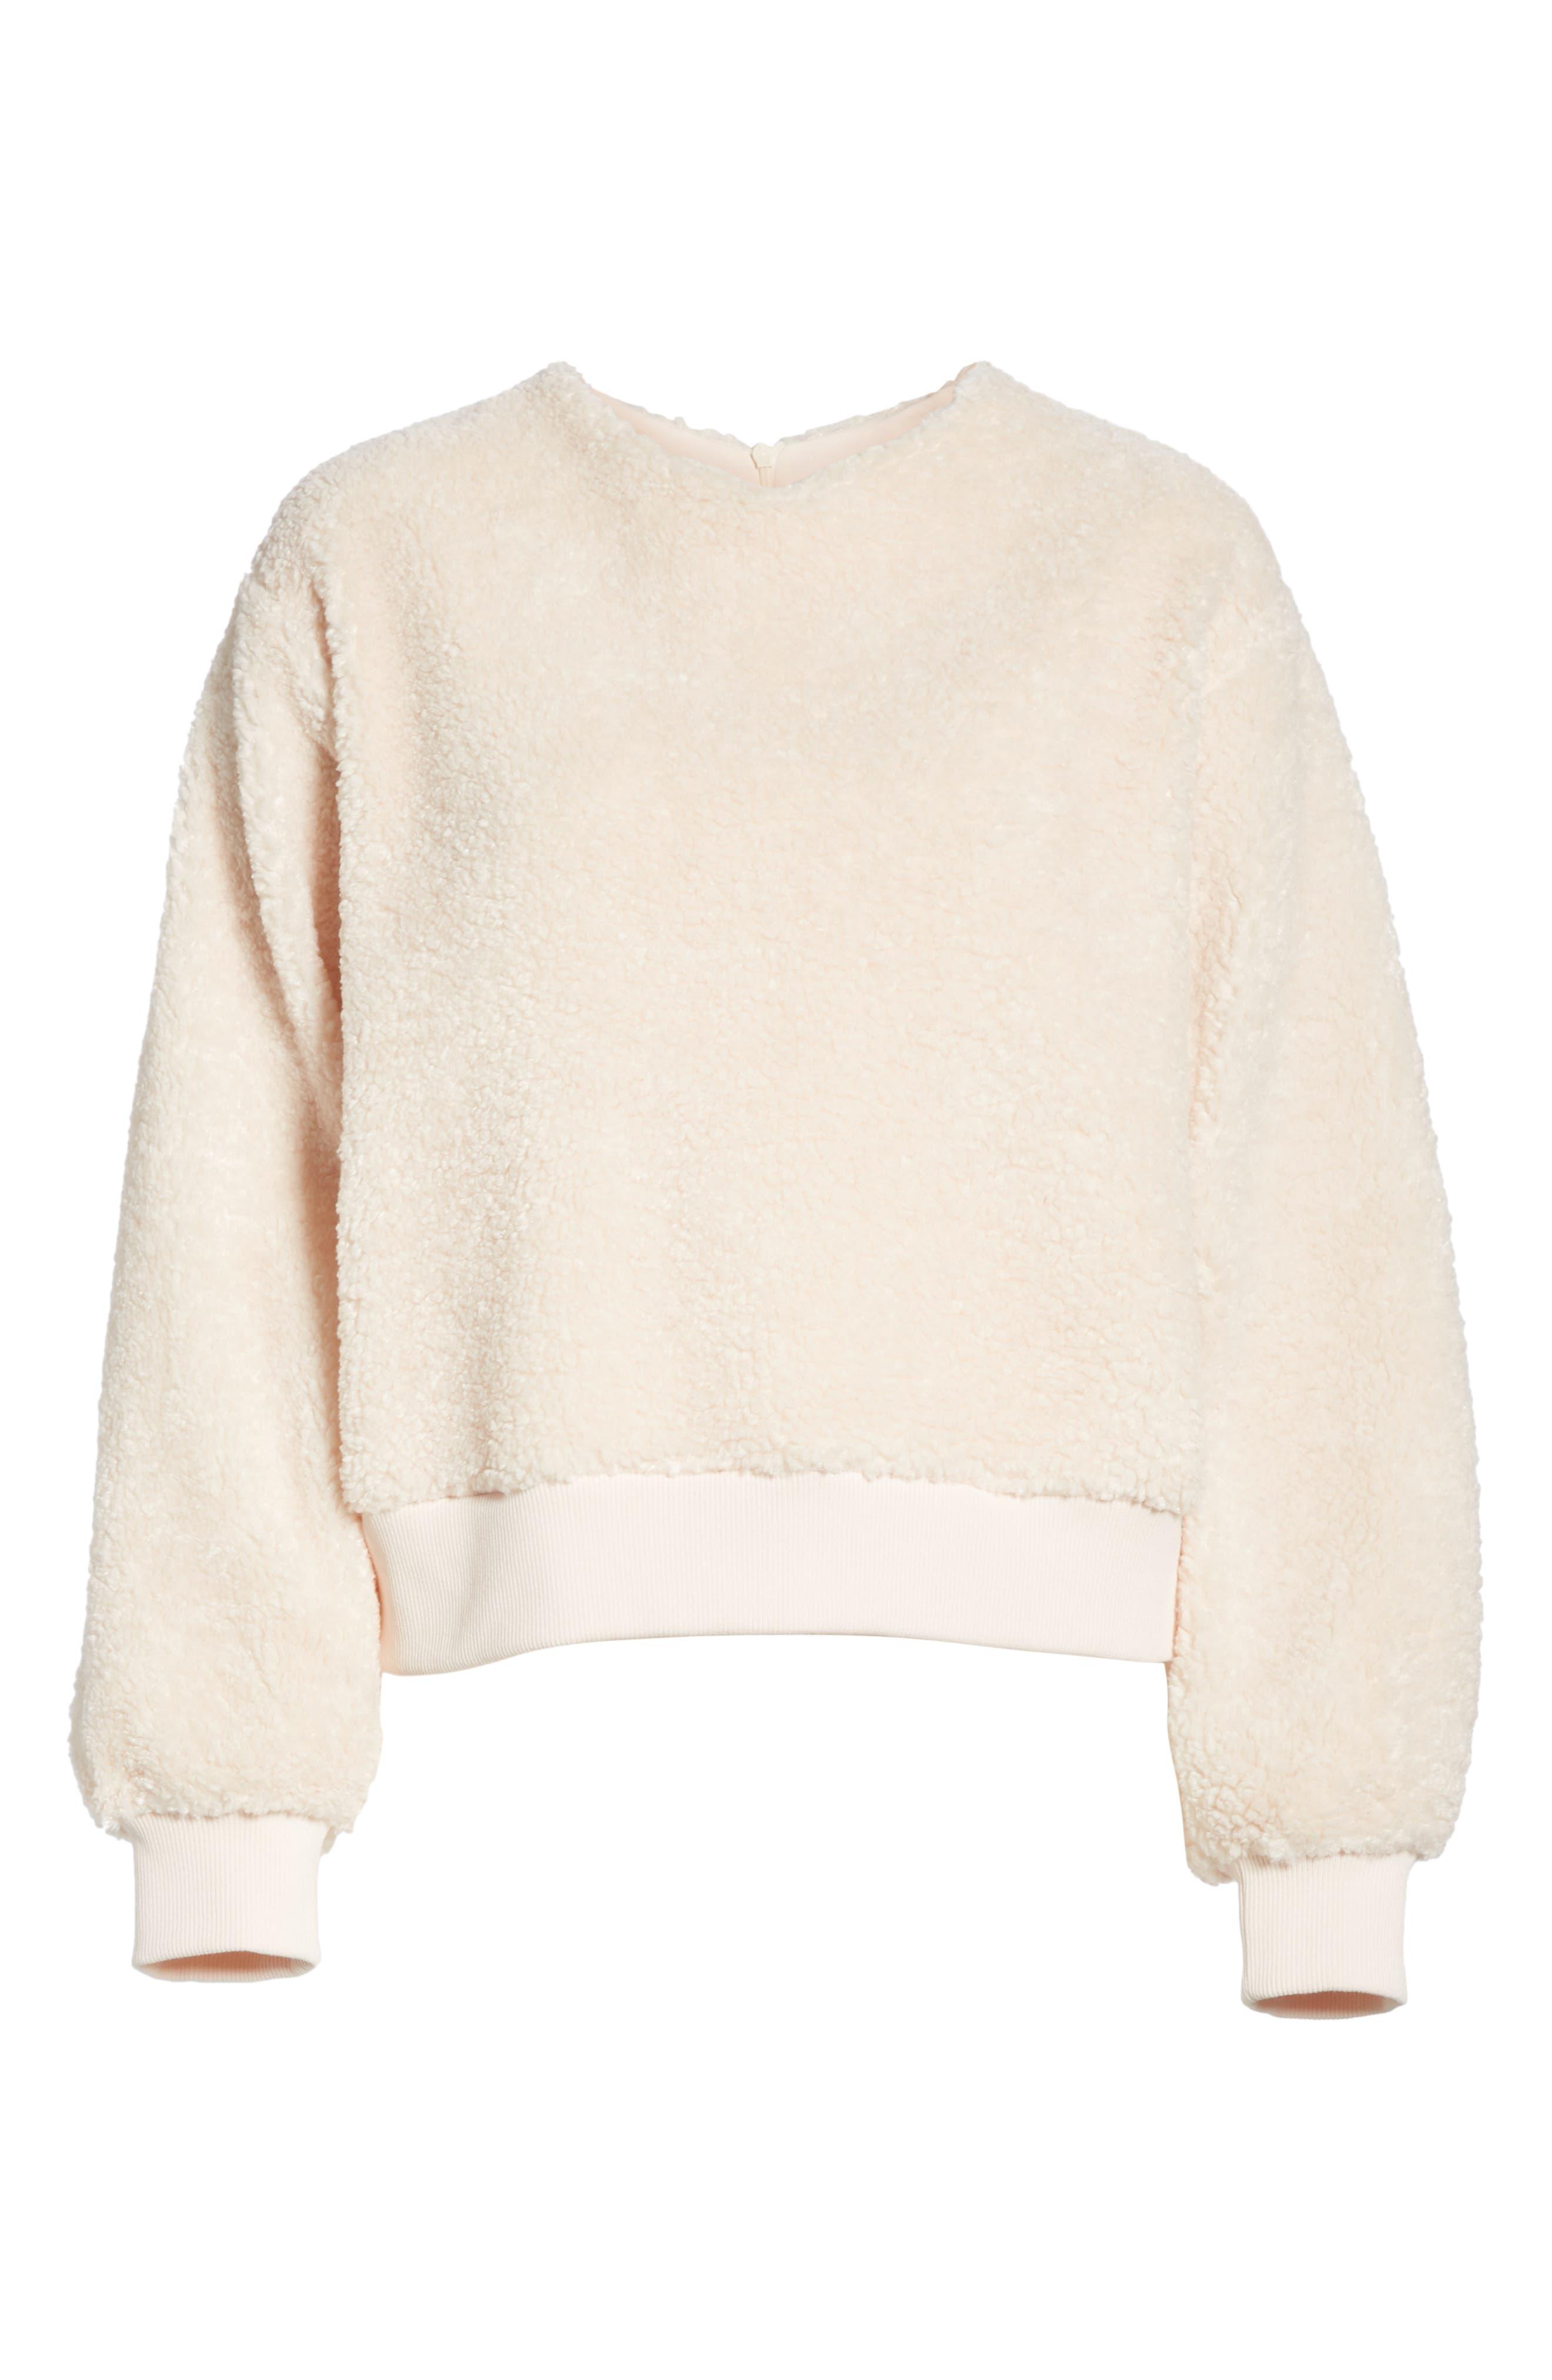 VINCE, Cozy Fleece Pullover, Alternate thumbnail 6, color, SOFT PINK